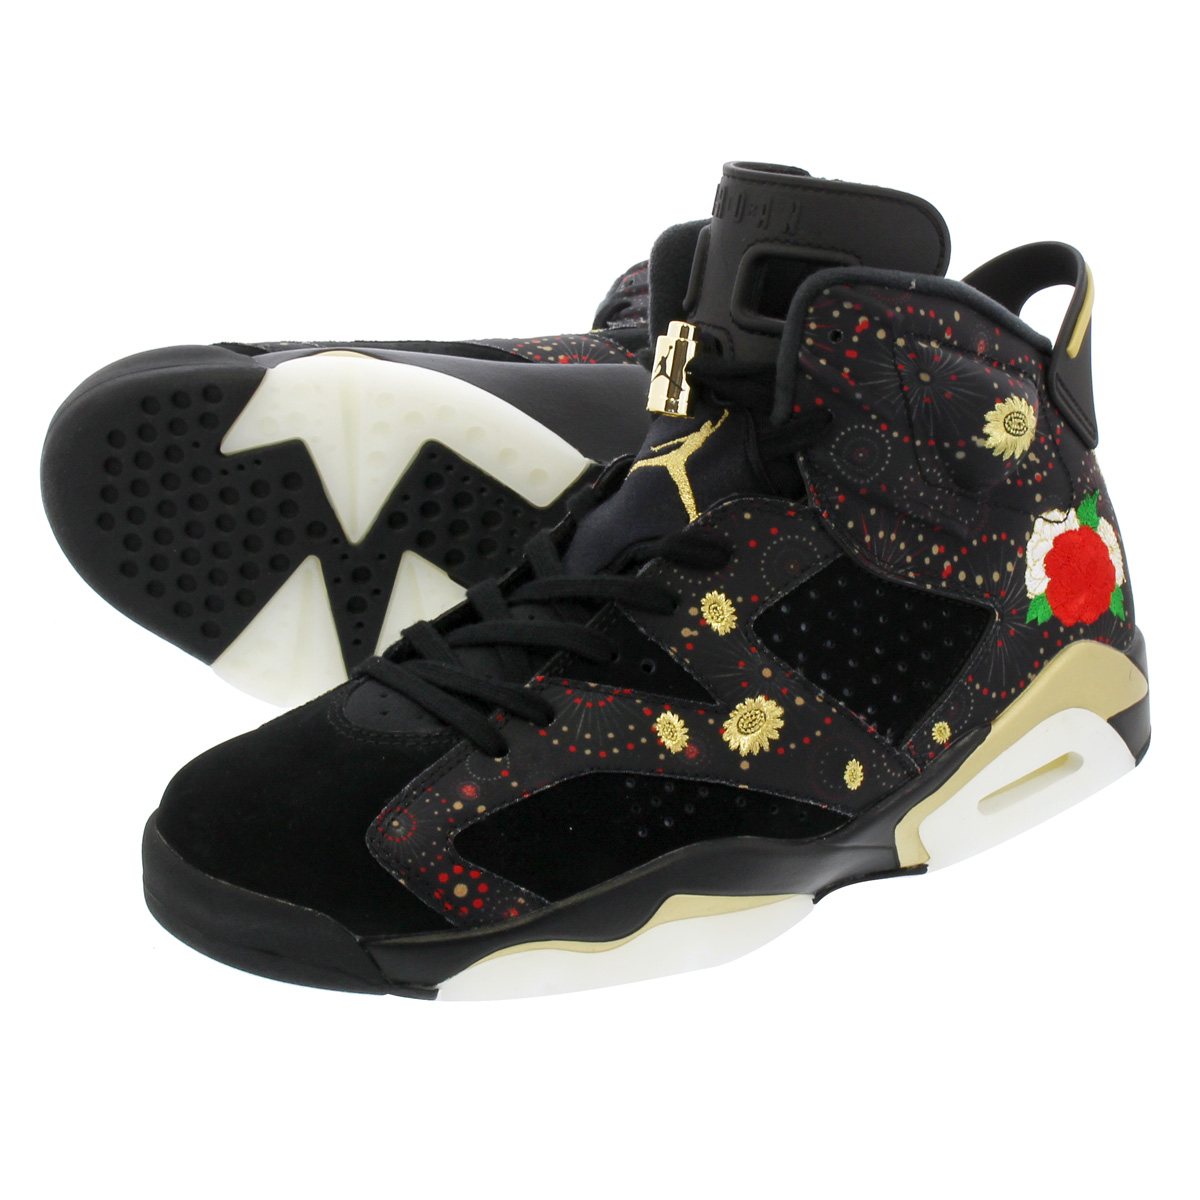 711fa2efb256 NIKE AIR JORDAN 6 RETRO CNY Nike Air Jordan 6 nostalgic CNY BLACK MULTI  COLOR SUMMIT WHITE METALLIC GOLD